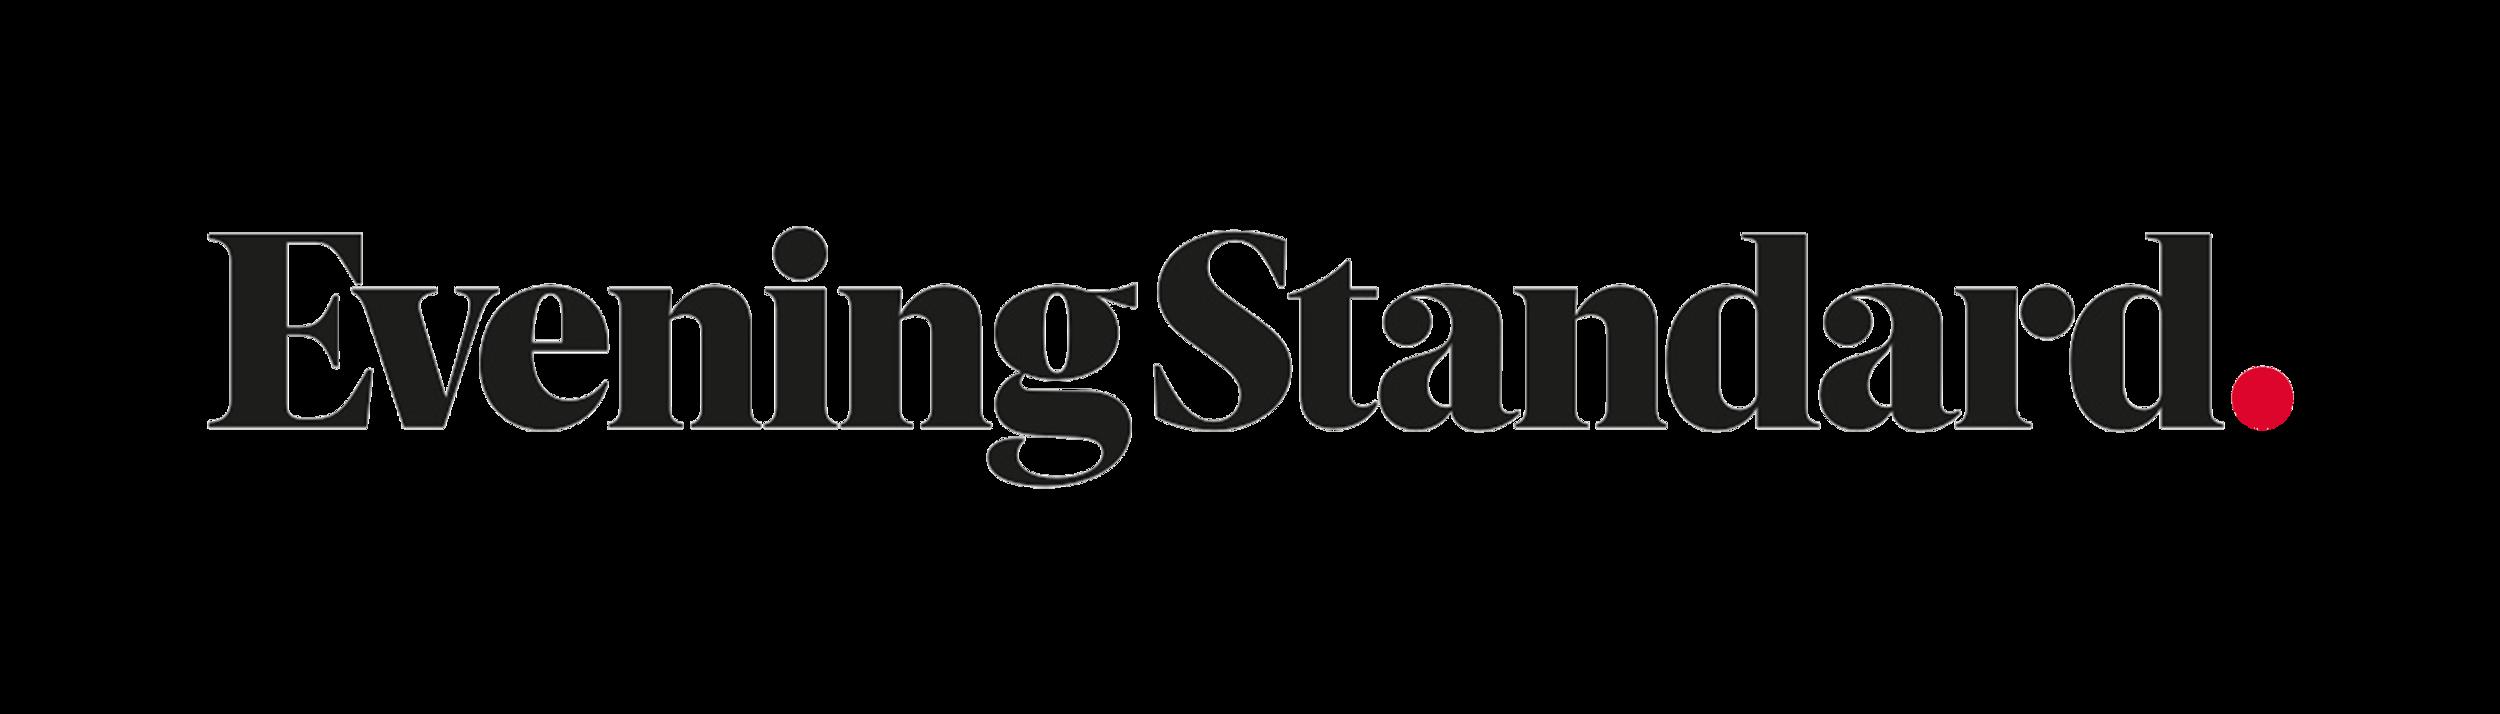 LogoEveningStandard.png